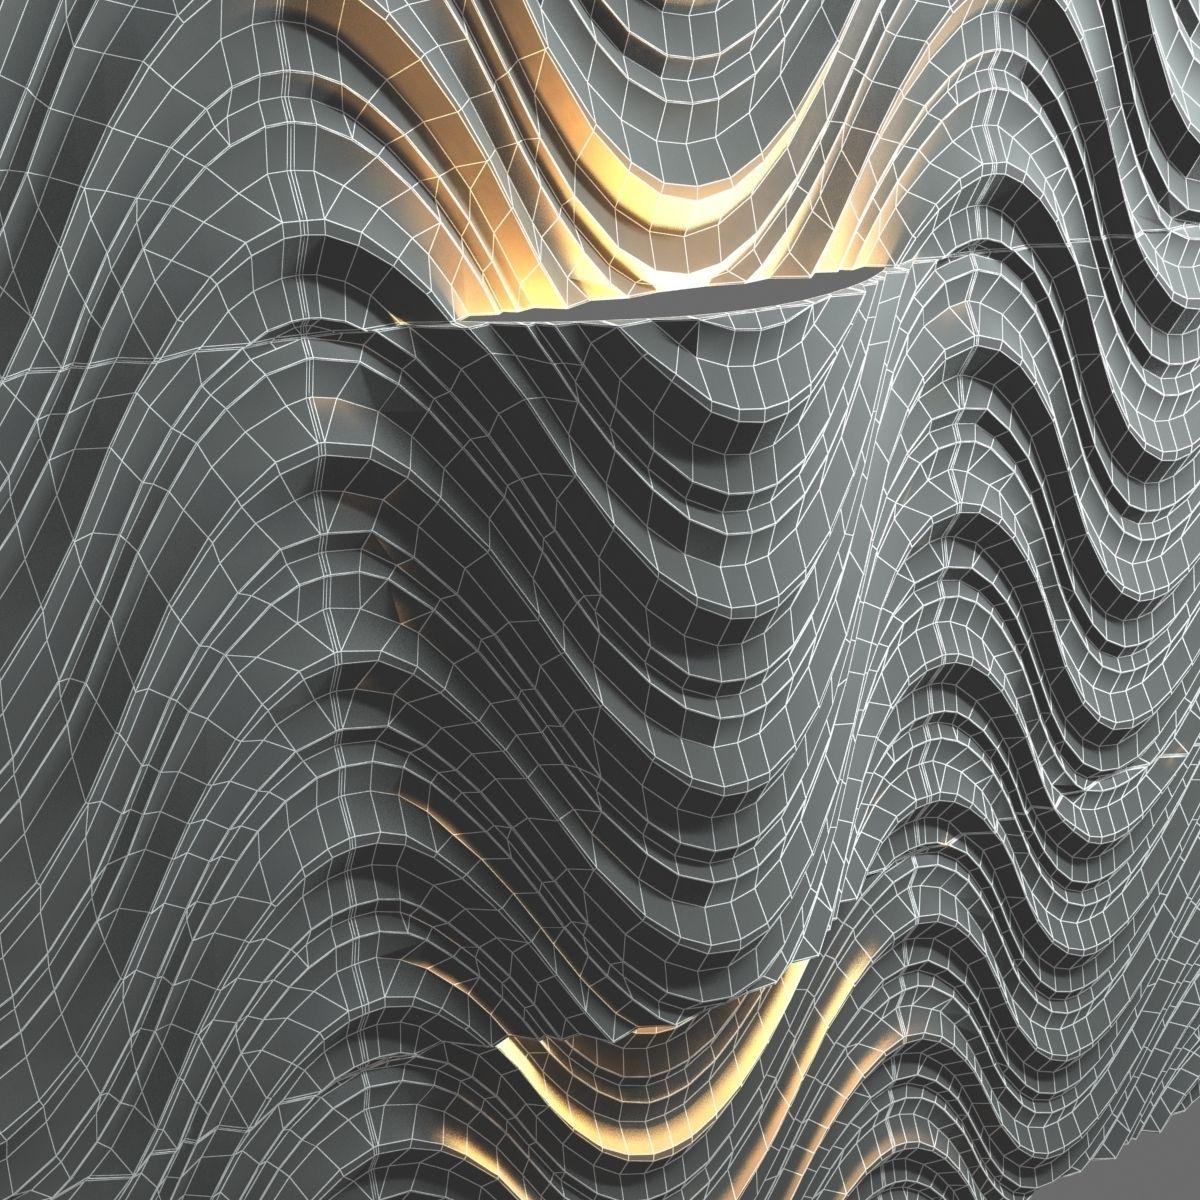 Lithos Design Seta 3d Wall Tiles Model Max Obj 3ds Fbx Mtl Unitypackage 5